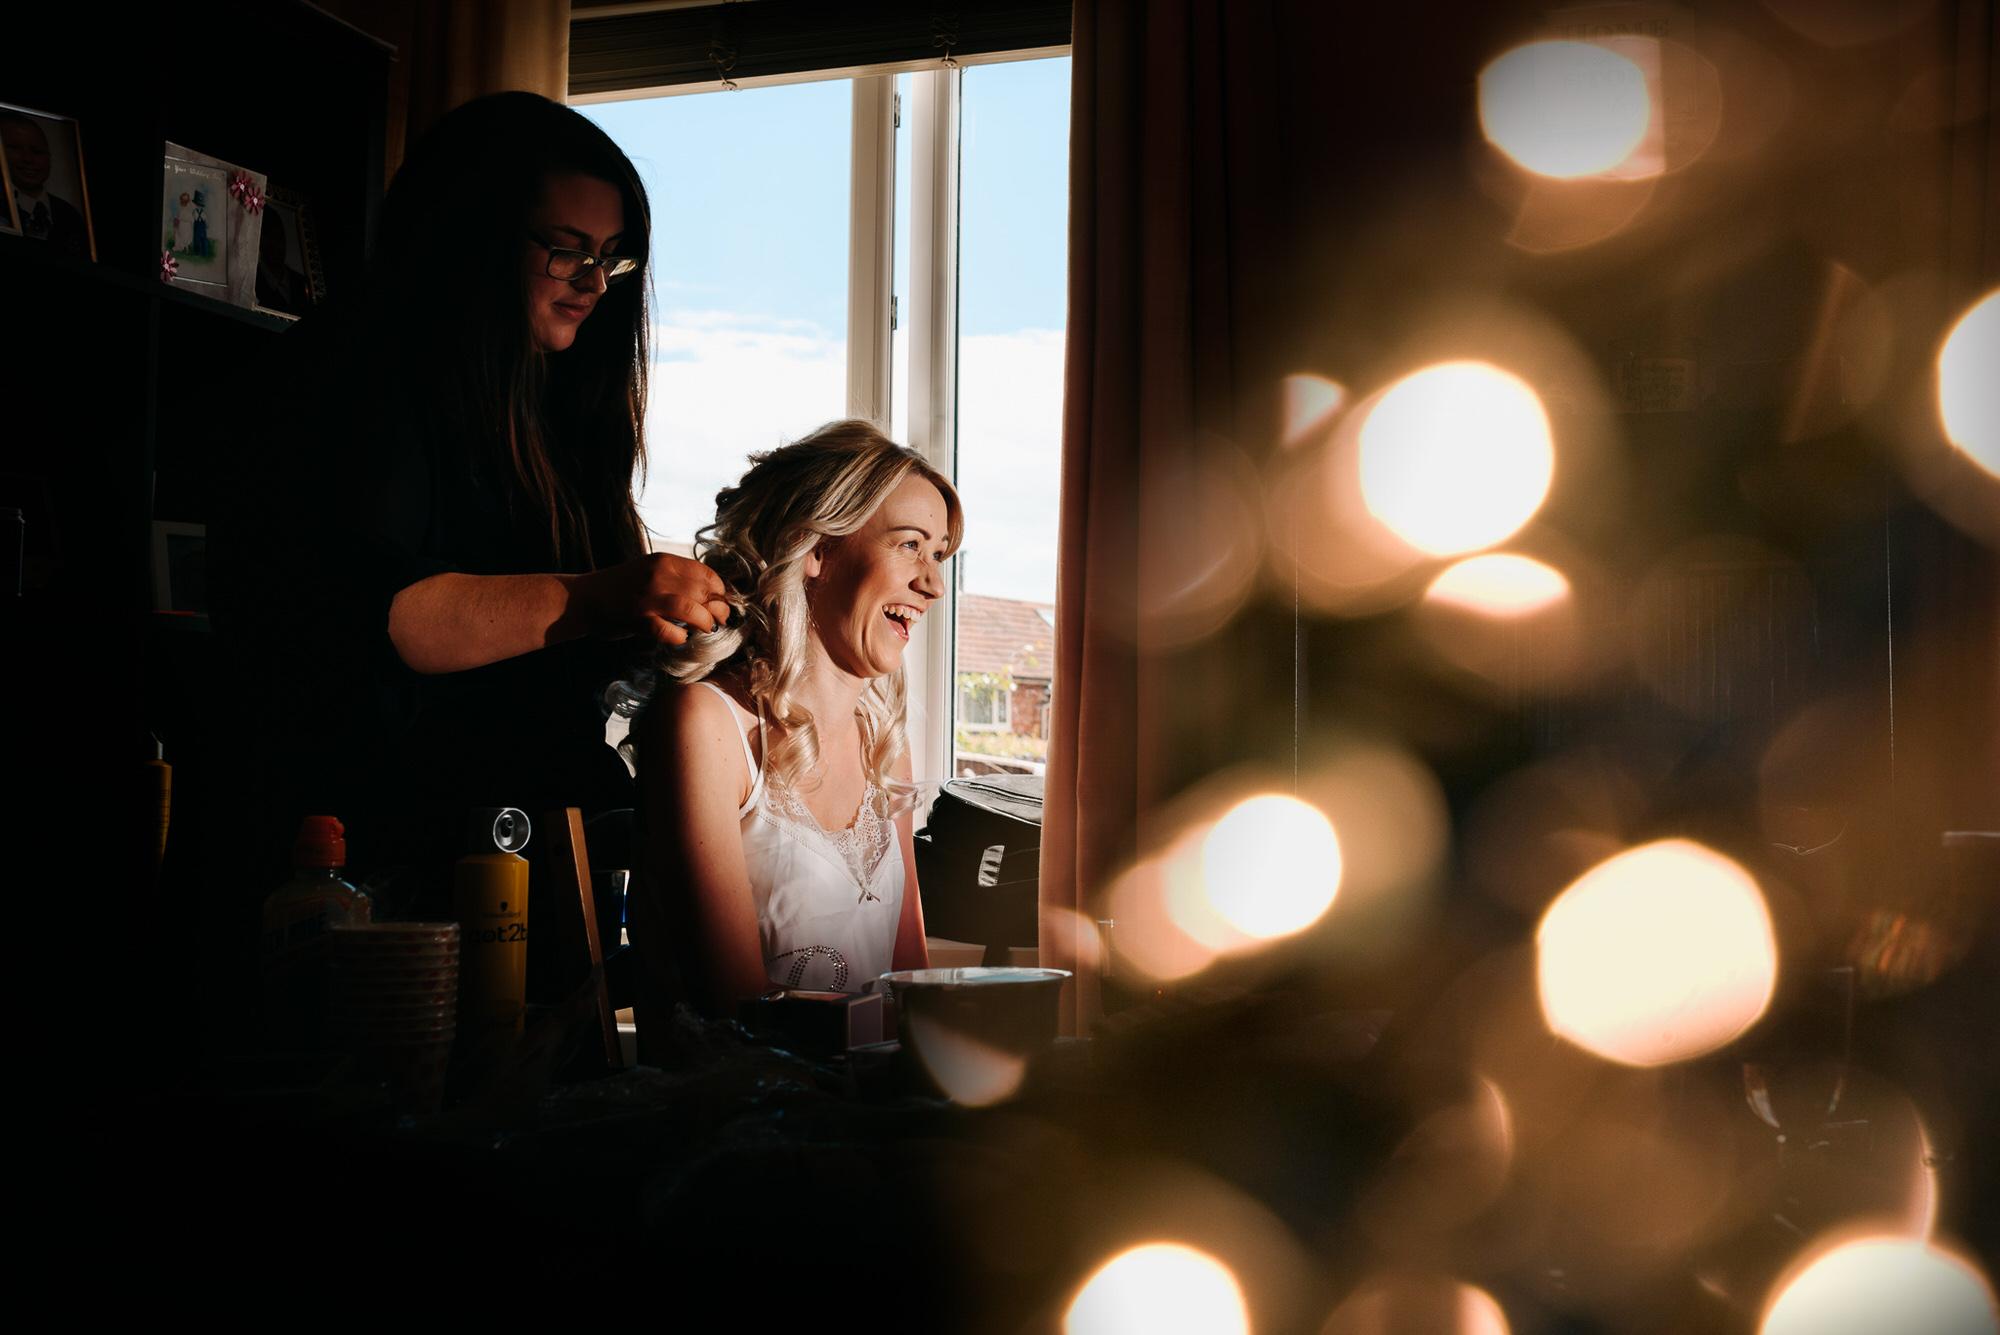 Best Of Yorkshire Wedding Photography 2017 - Martyn Hand-35.jpg